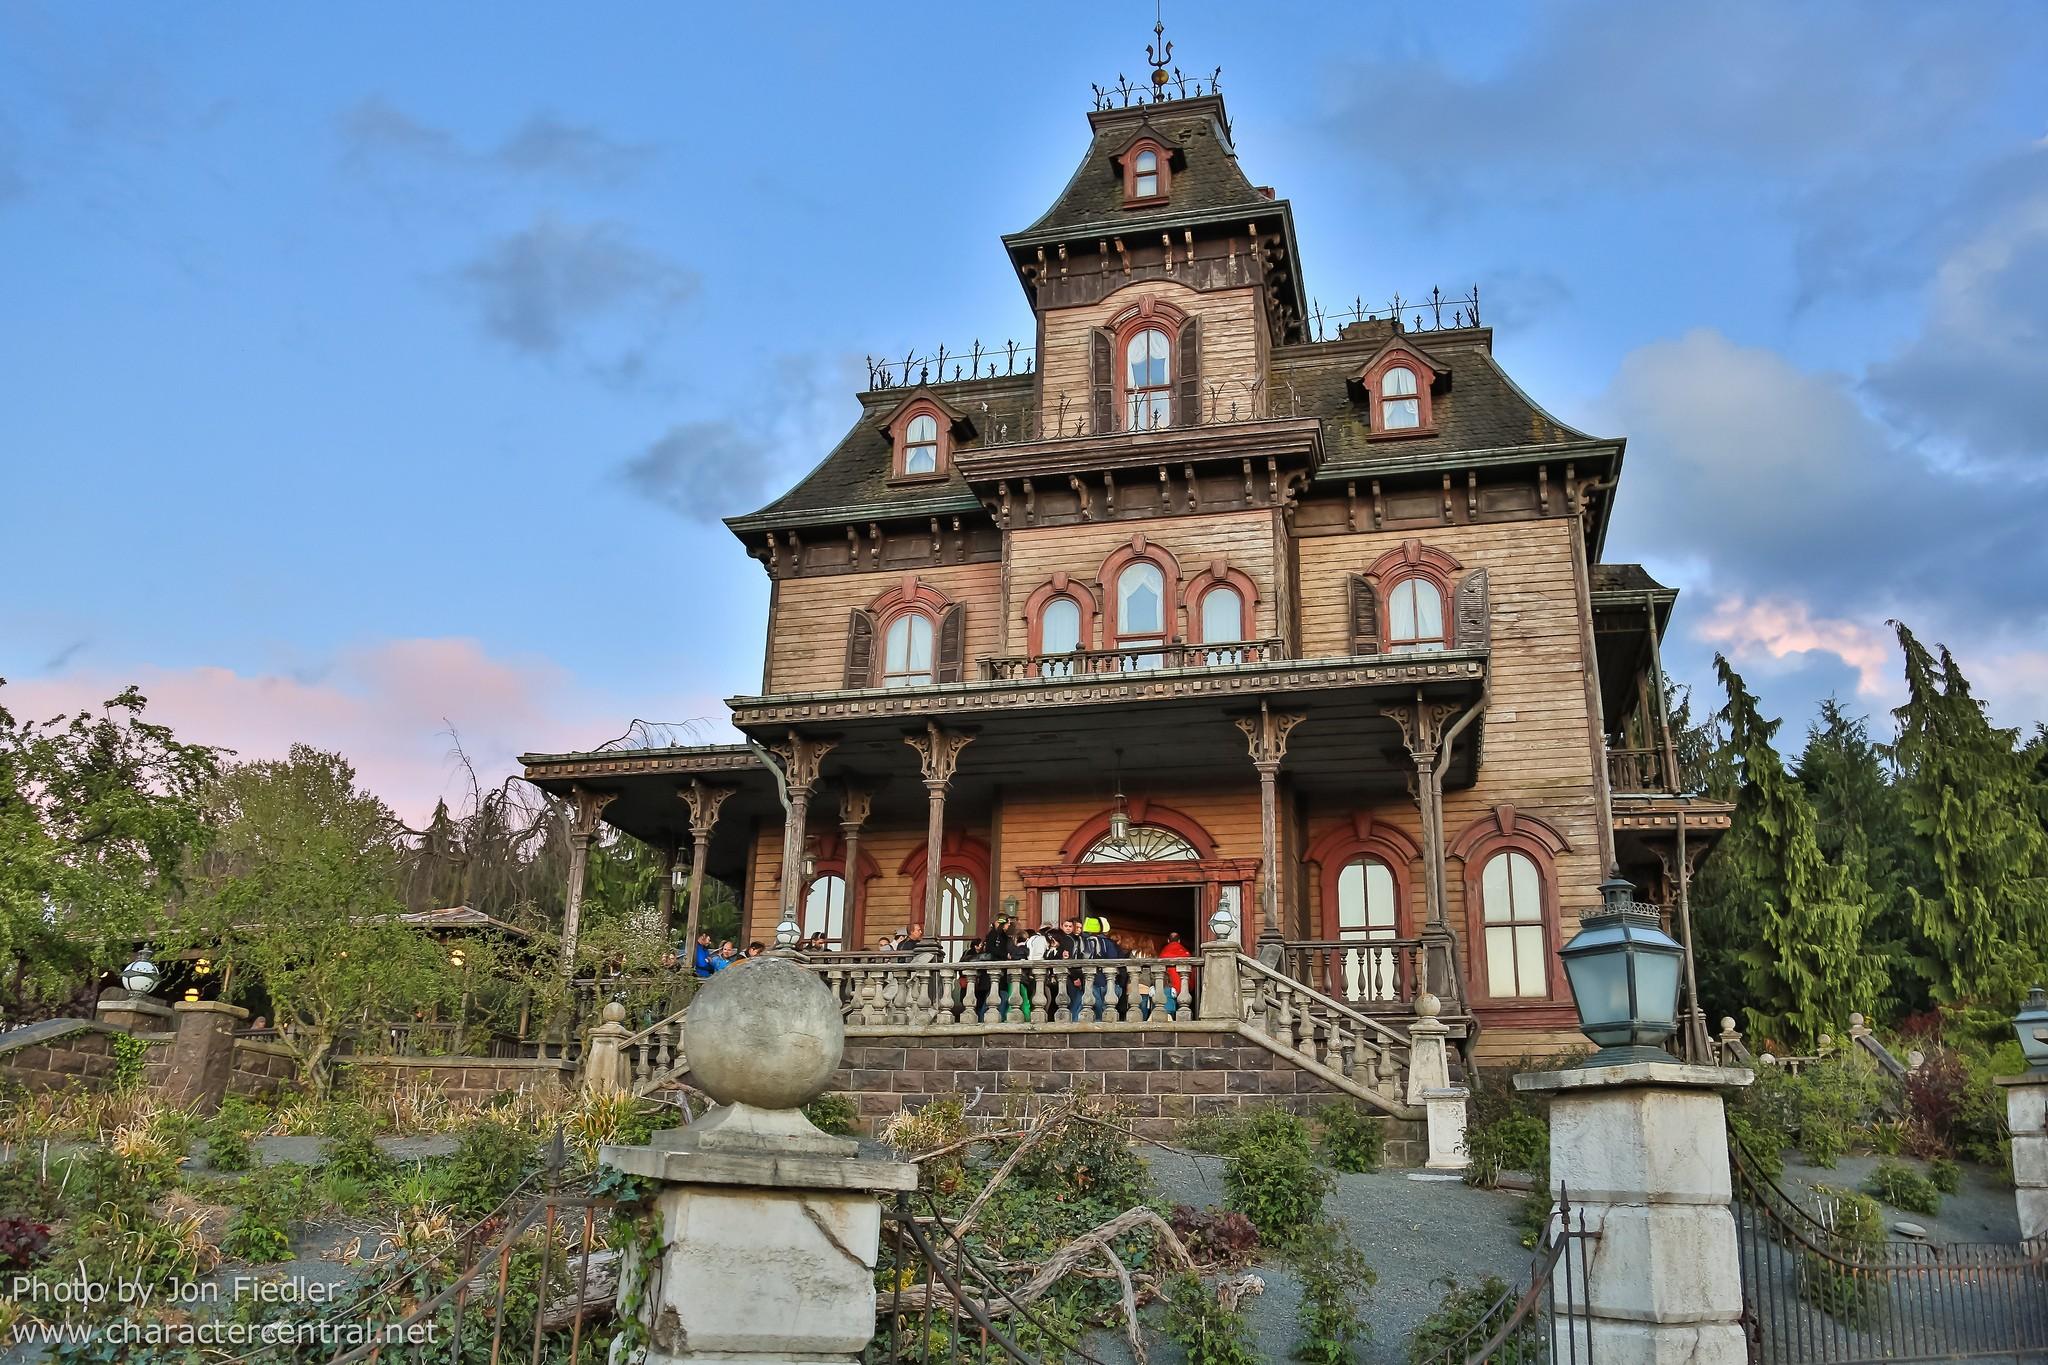 Phantom manor enfin rouvert daily disneyland - La maison hantee paris ...